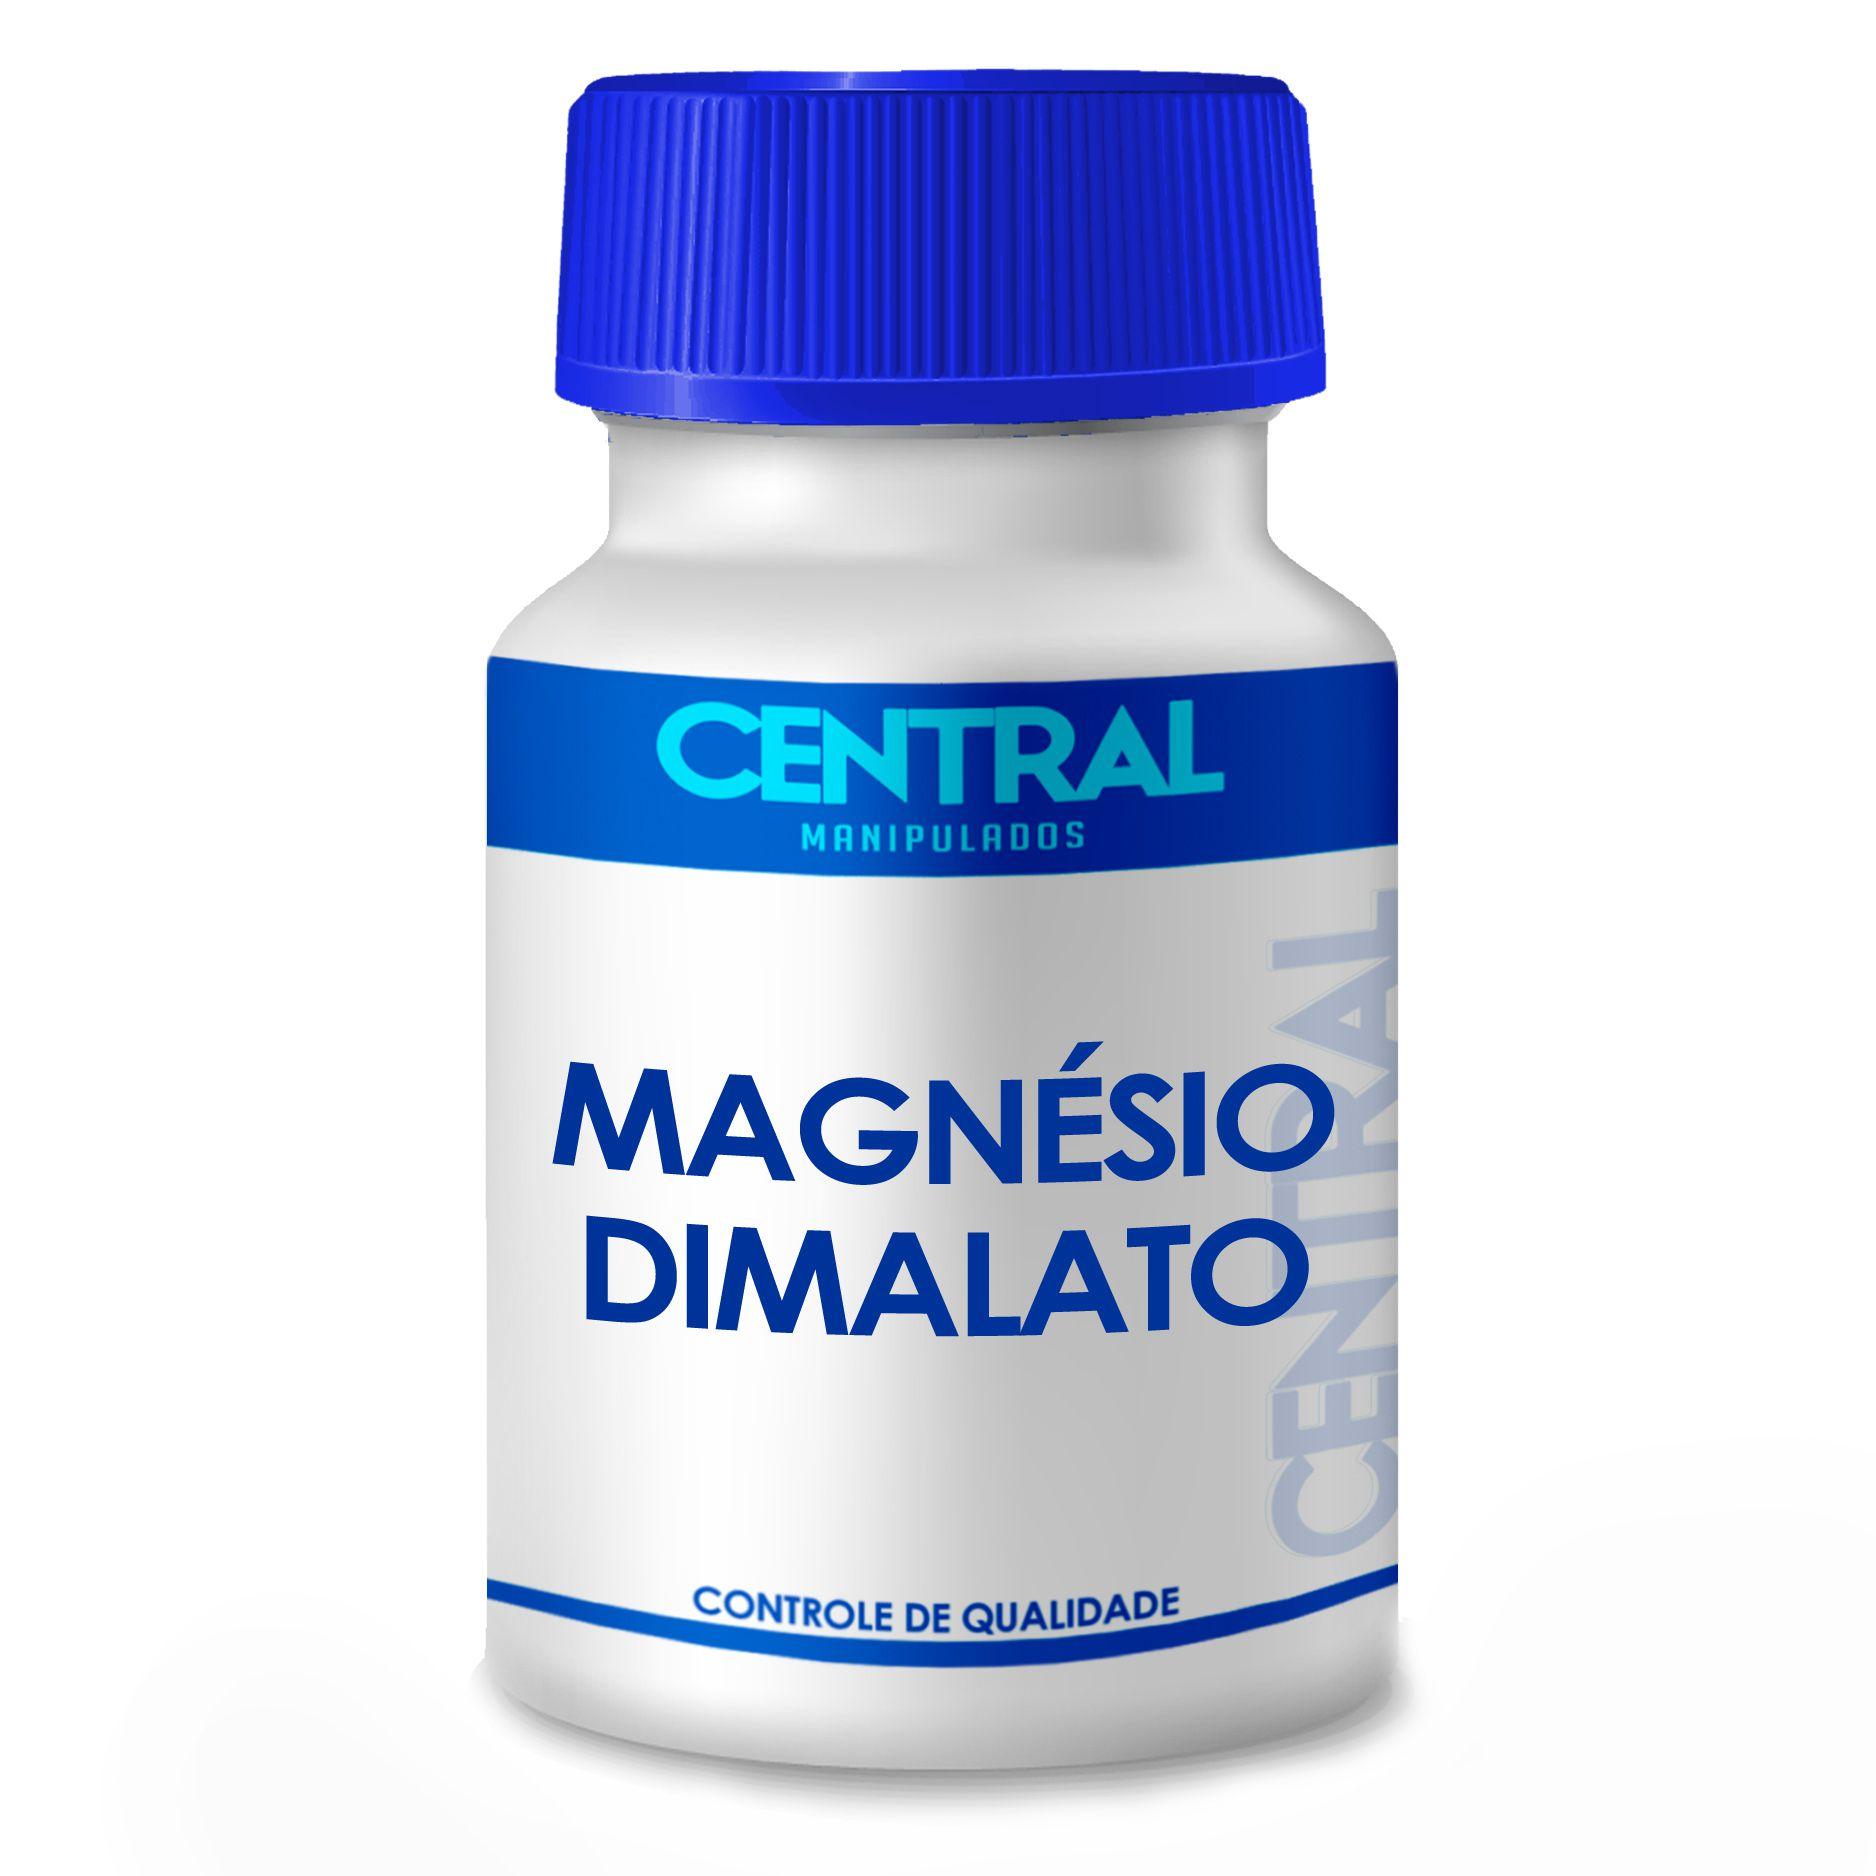 Magnésio dimalato 300mg 120 cápsulas - Melhora a fraqueza muscular e a saúde óssea